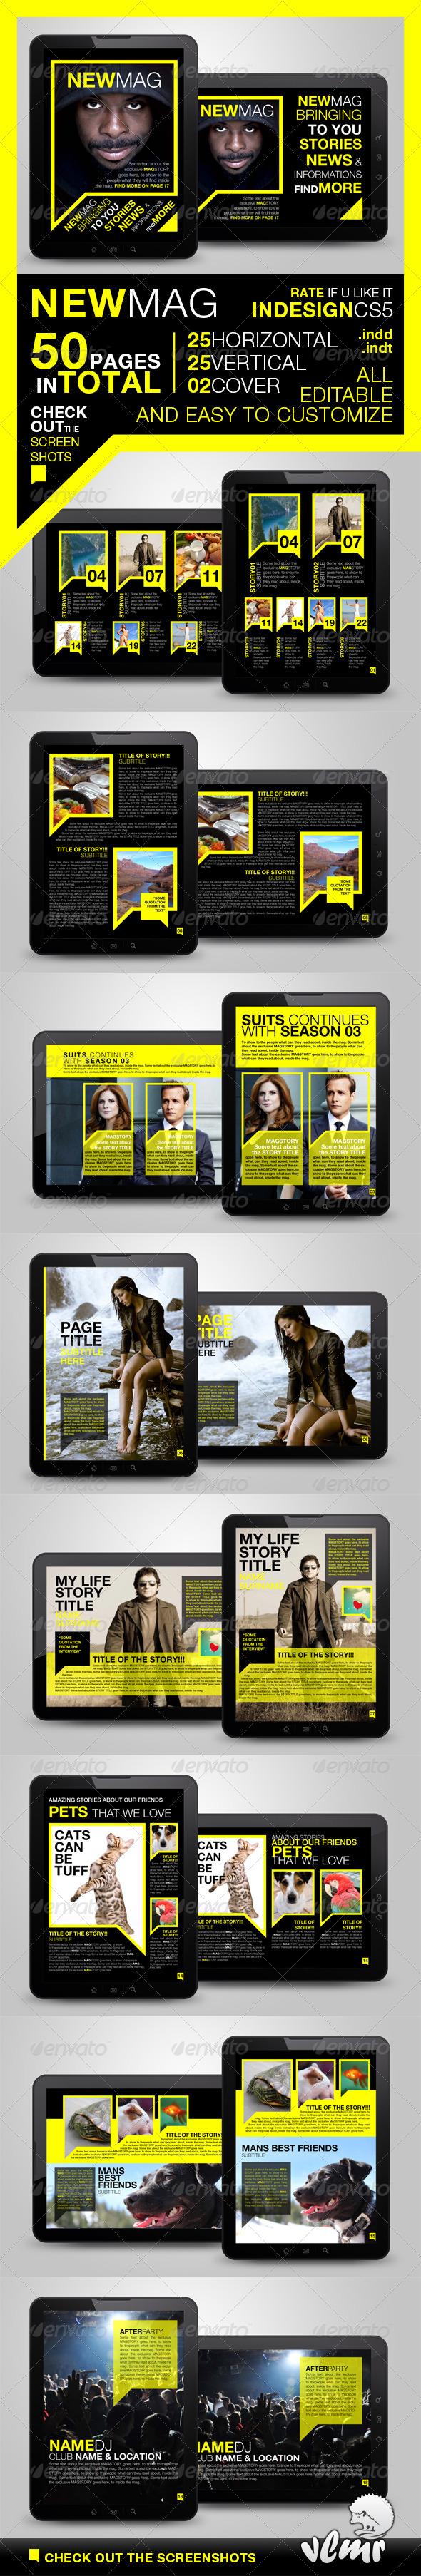 Newmag Tablet Magazine Template - Digital Magazines ePublishing